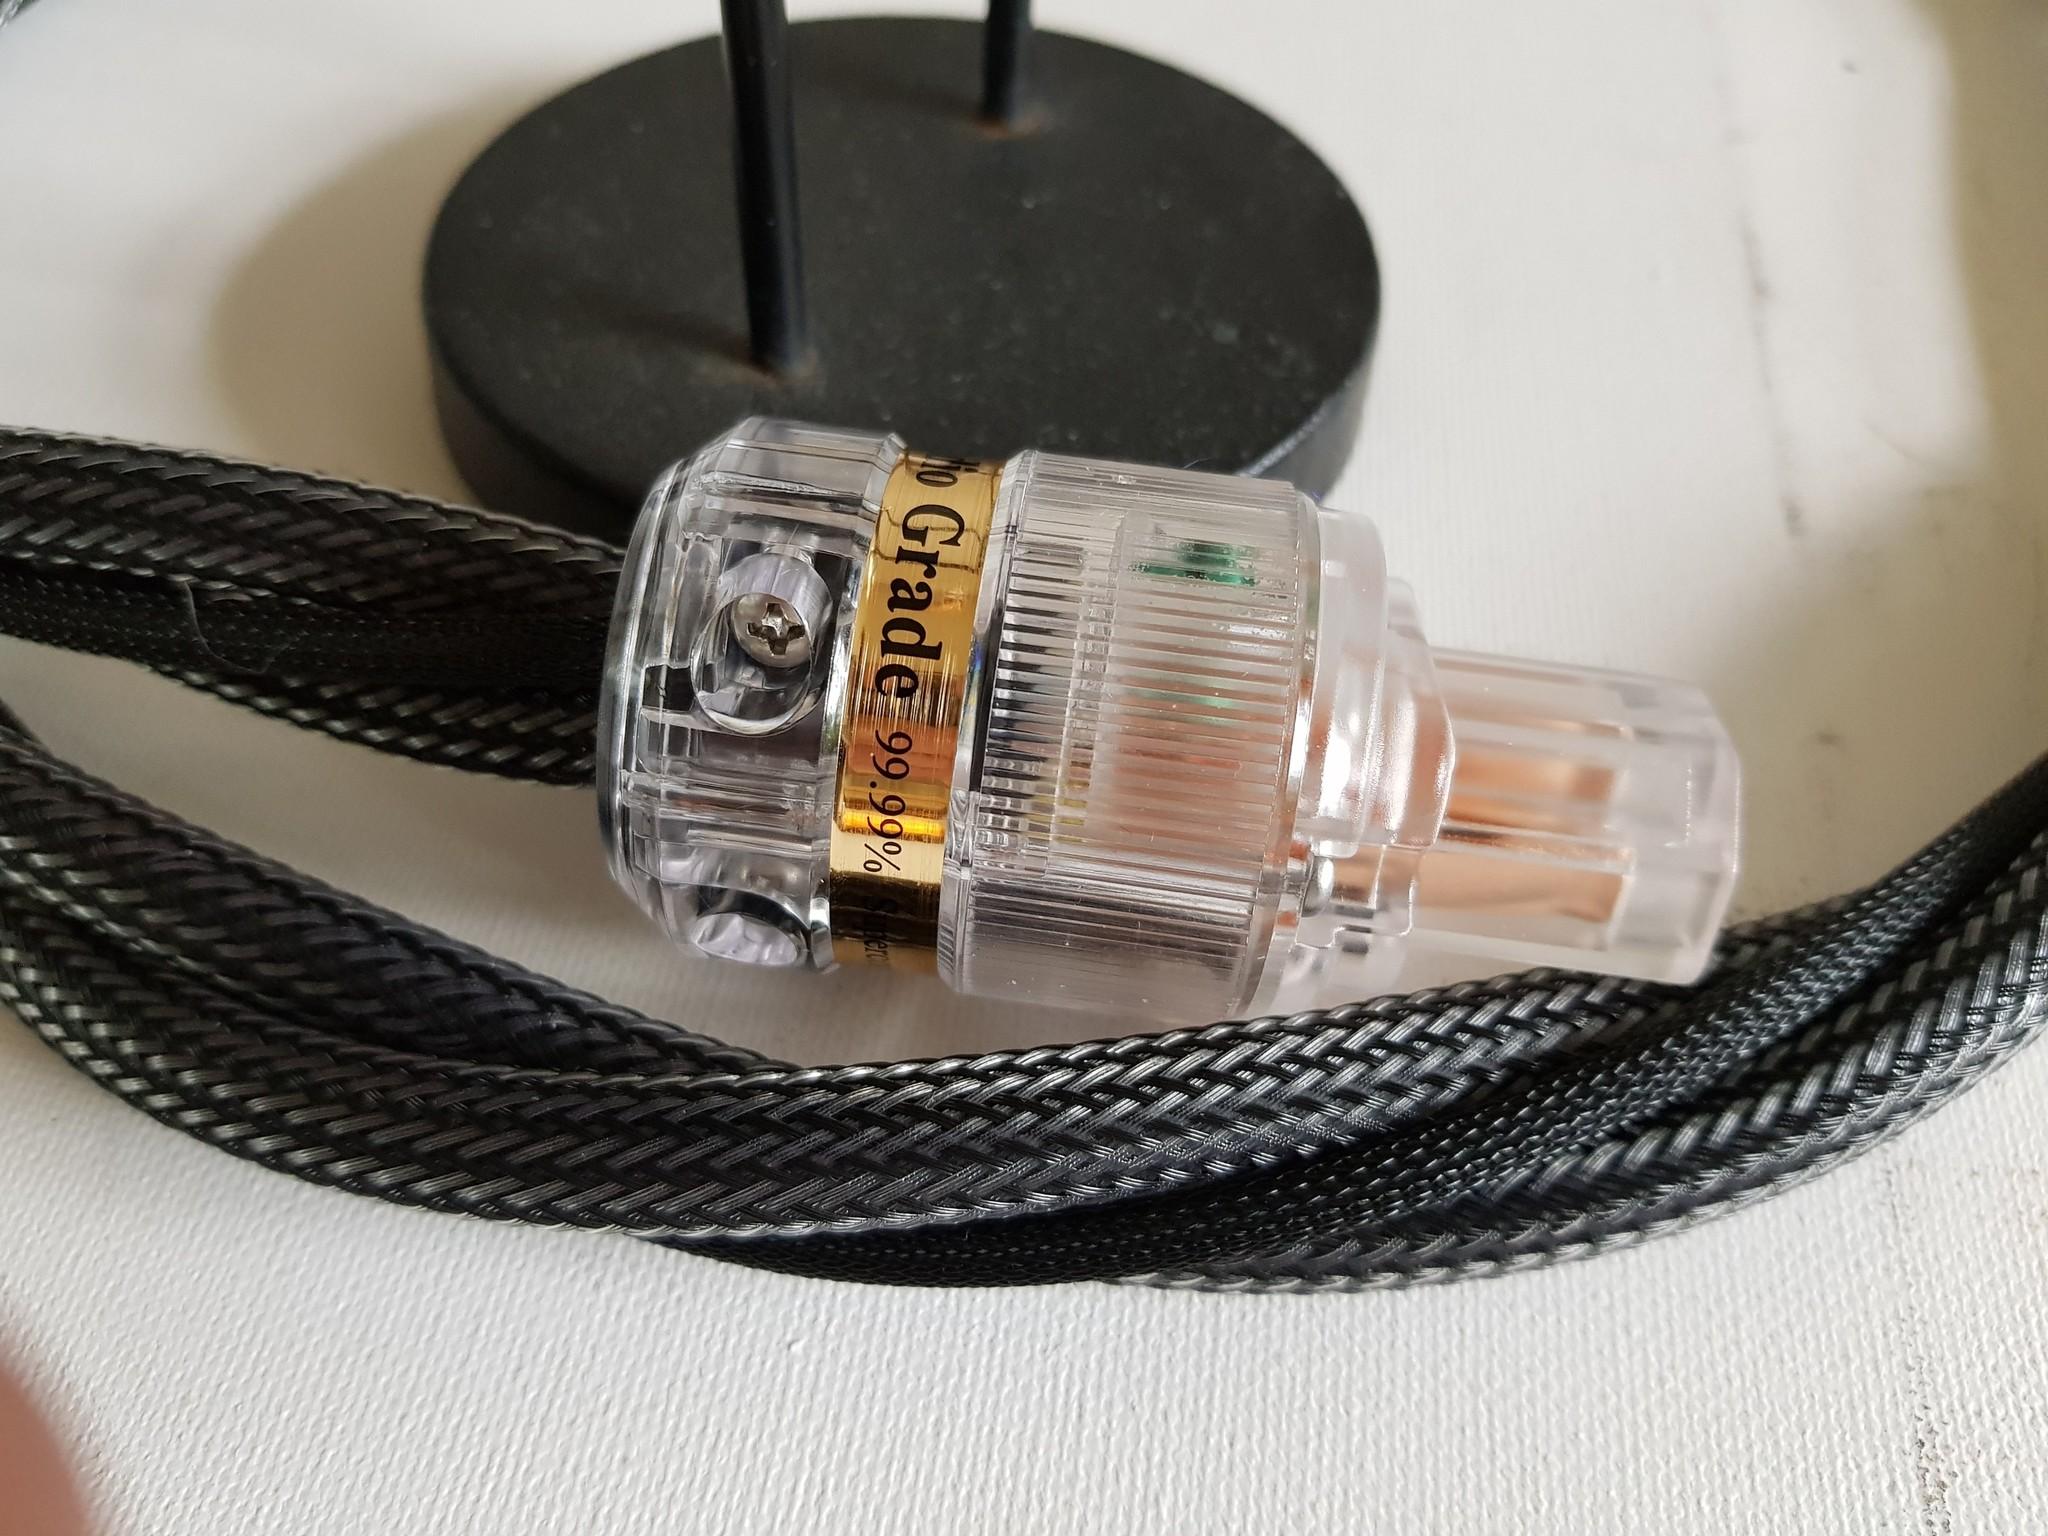 M-WAY M-Way 3DW AC stroomkabel